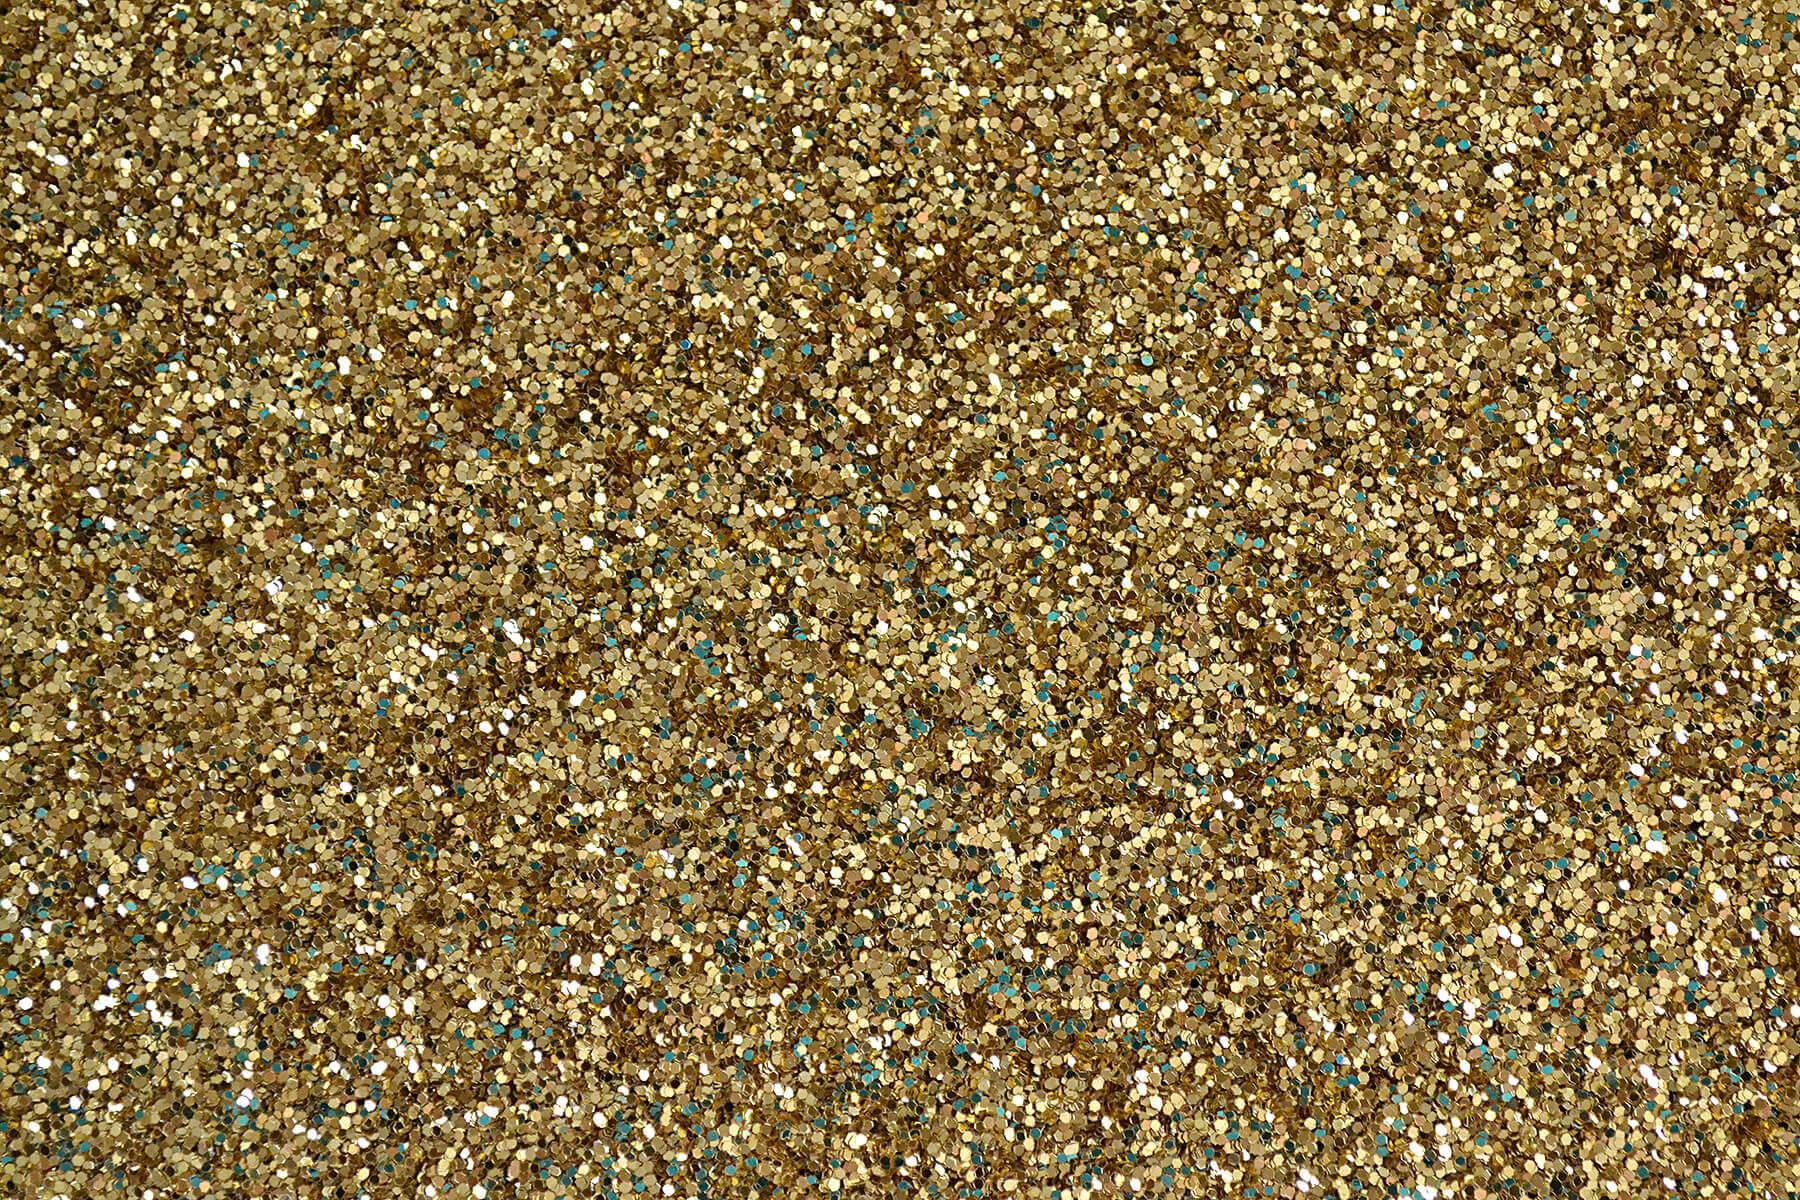 GOLD GLITTER high res desktop image smart phone background 1800x1200